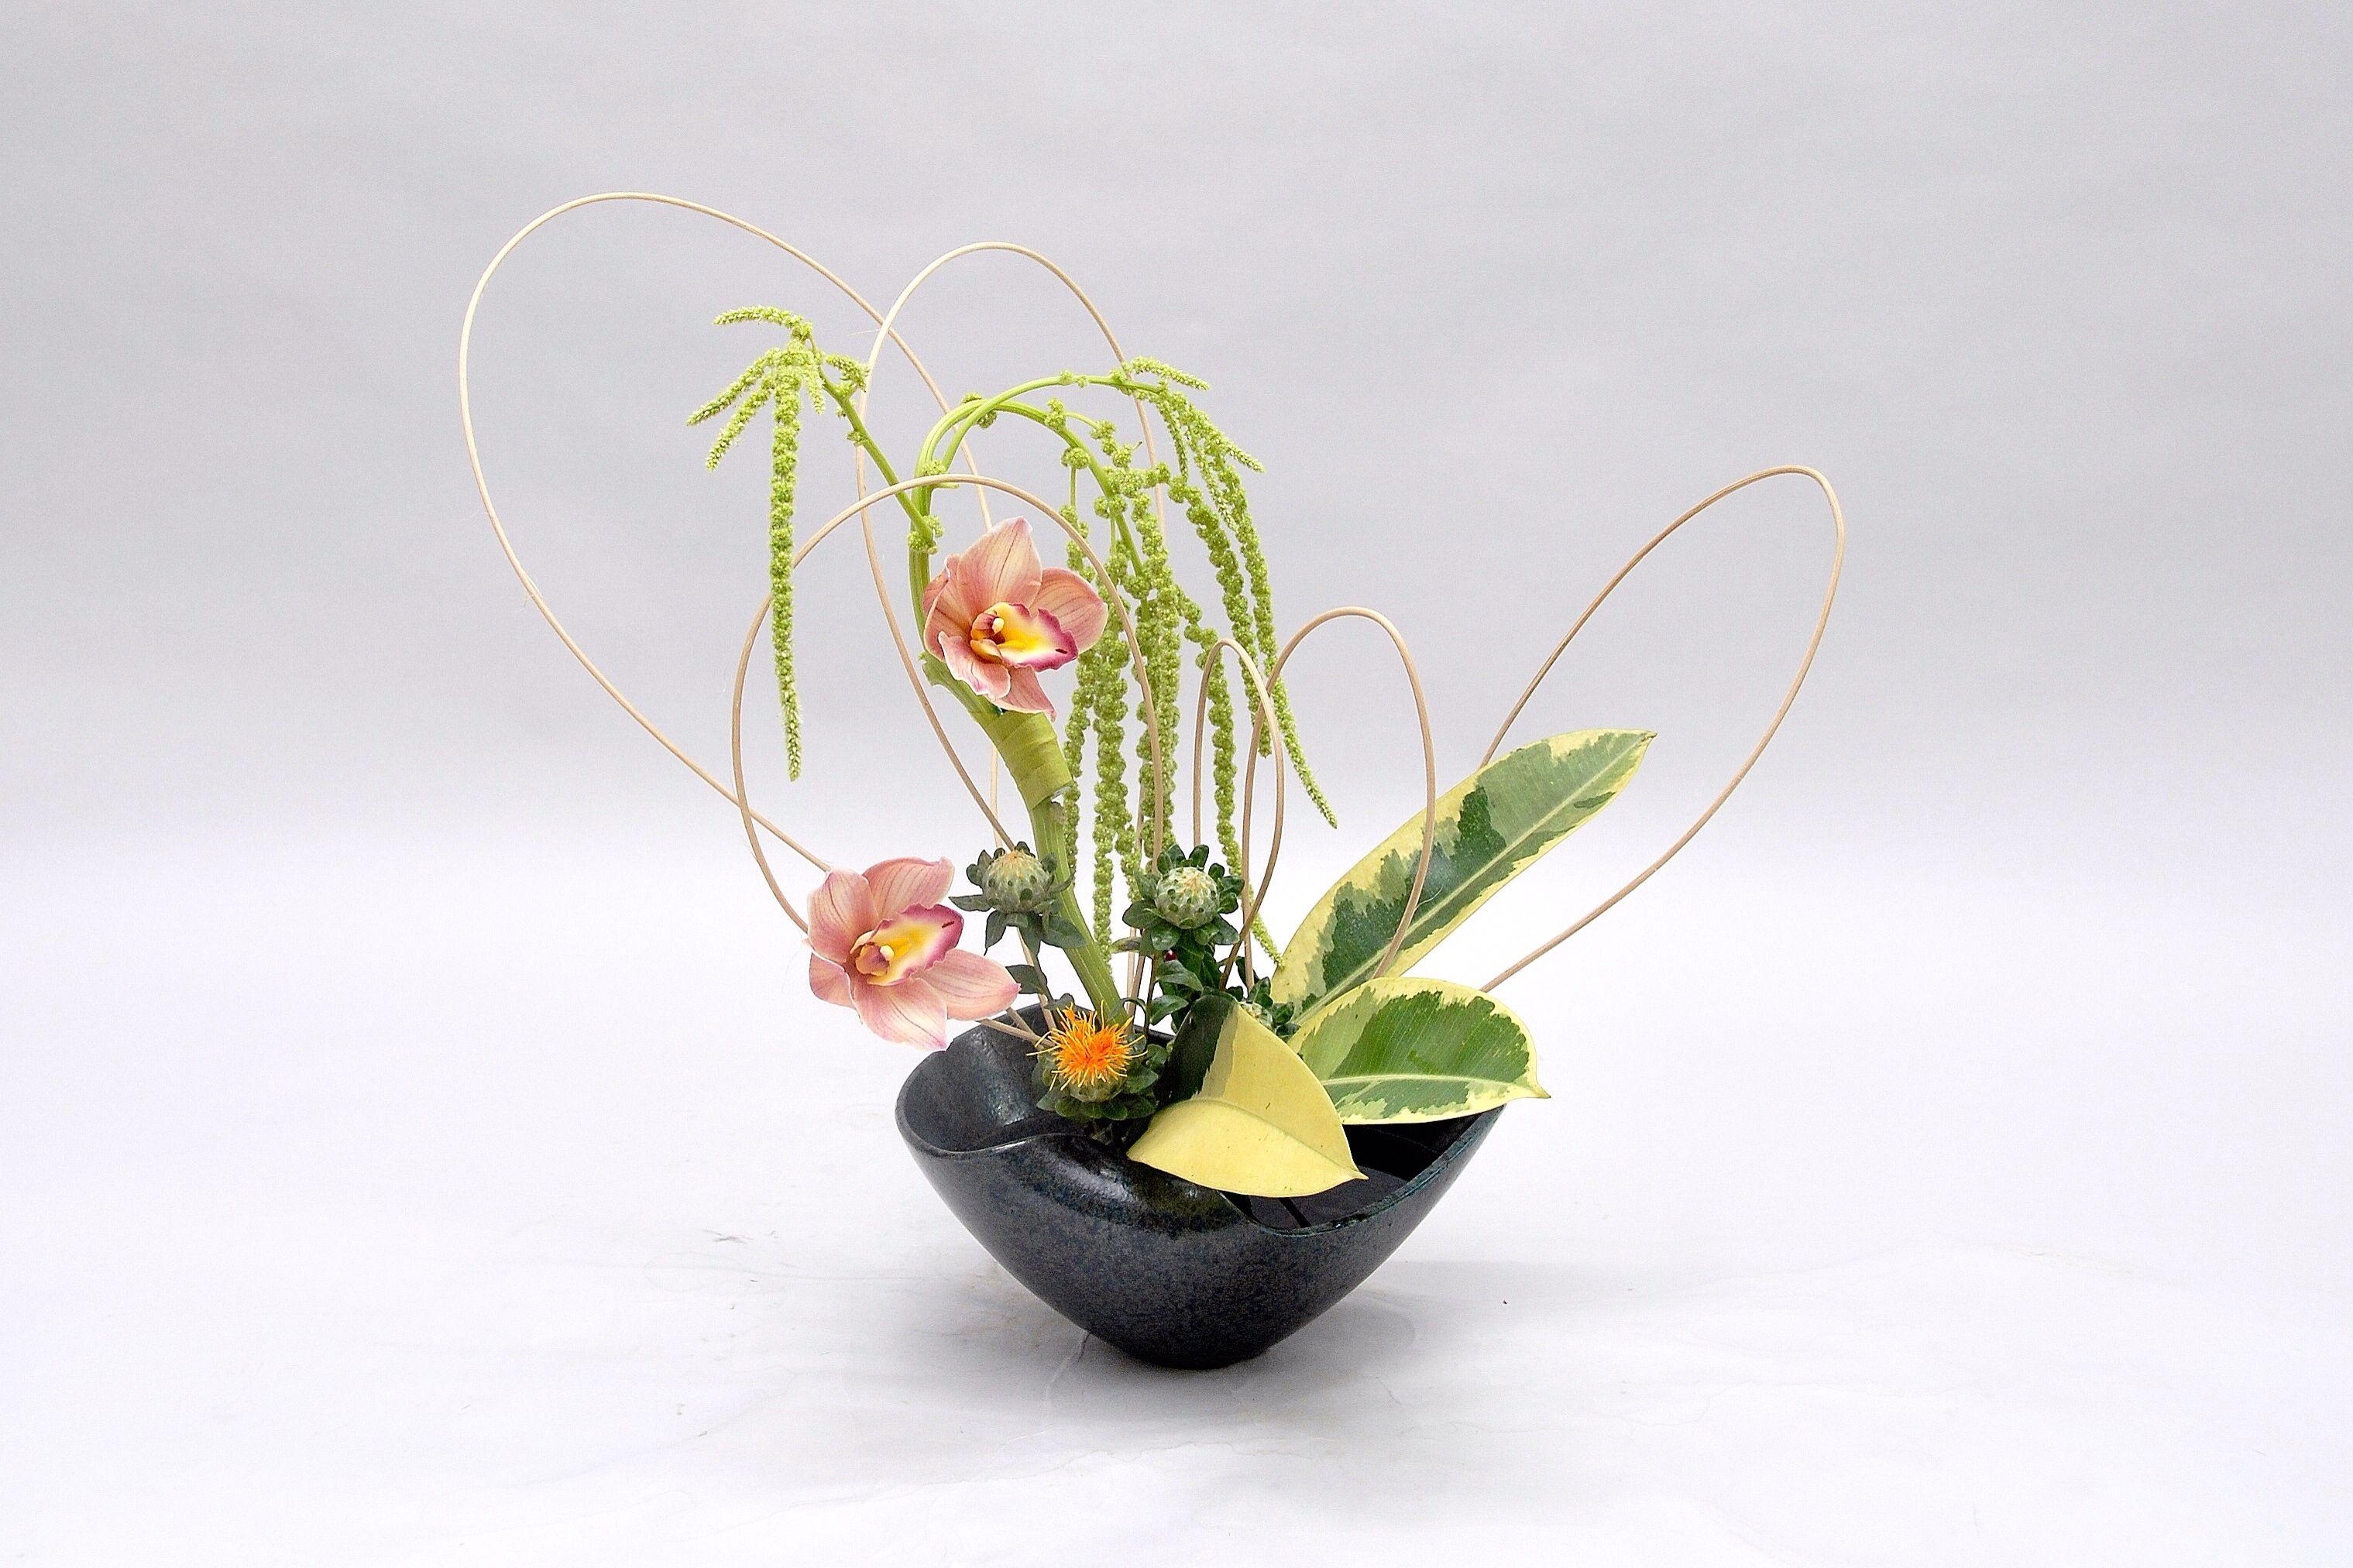 Ikebana ikenobo flower arrangement jiyuka. Indonesia